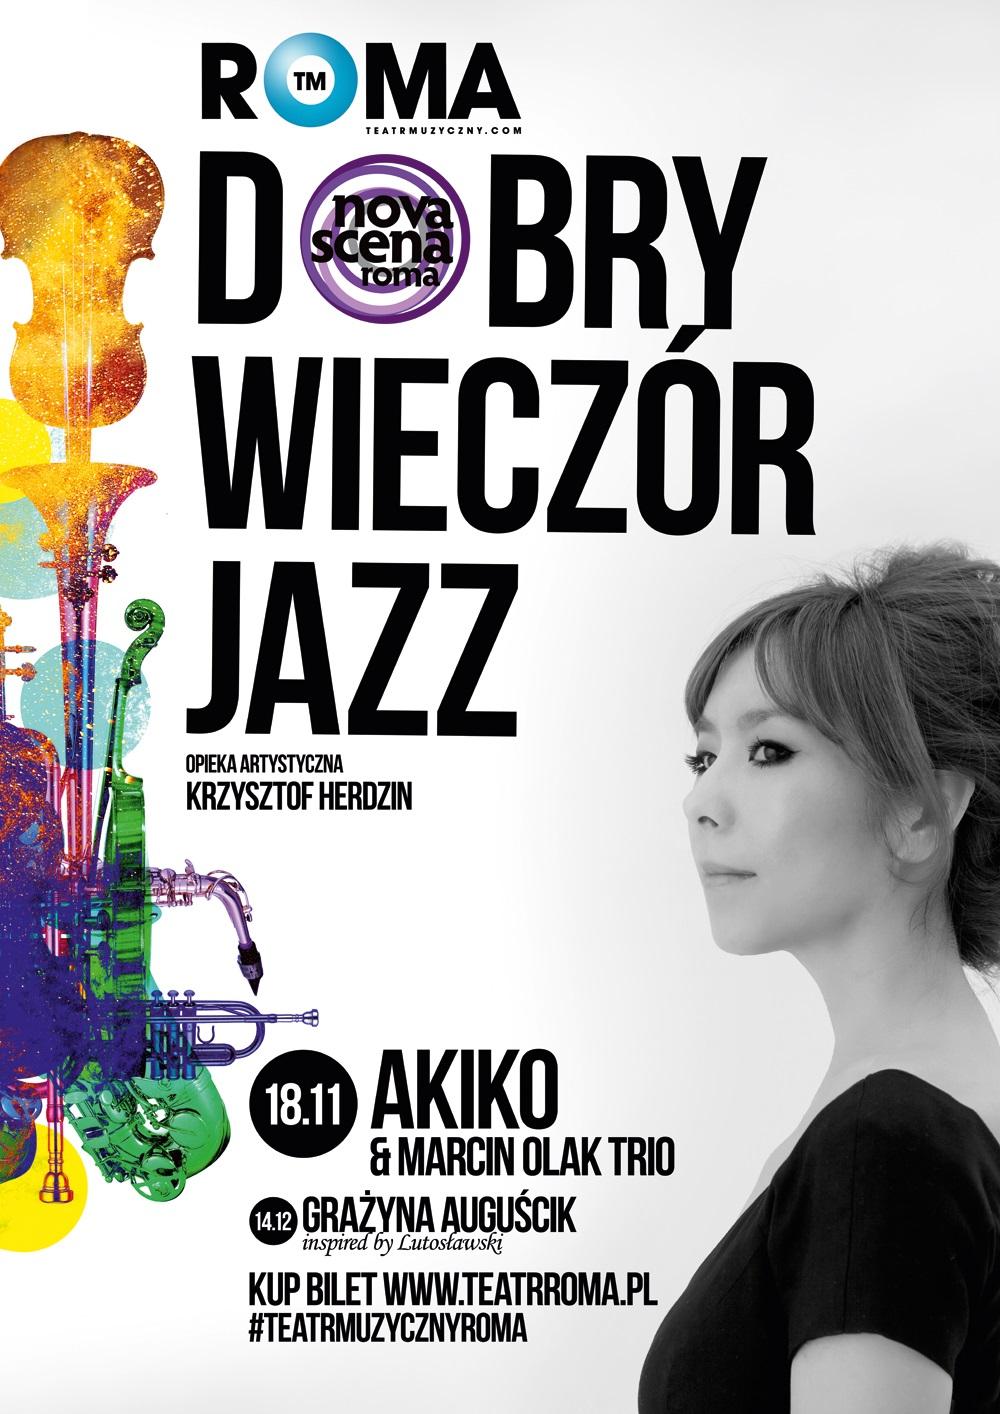 Koncert Akiko, plakat (źródło: materiały prasowe organizatora)